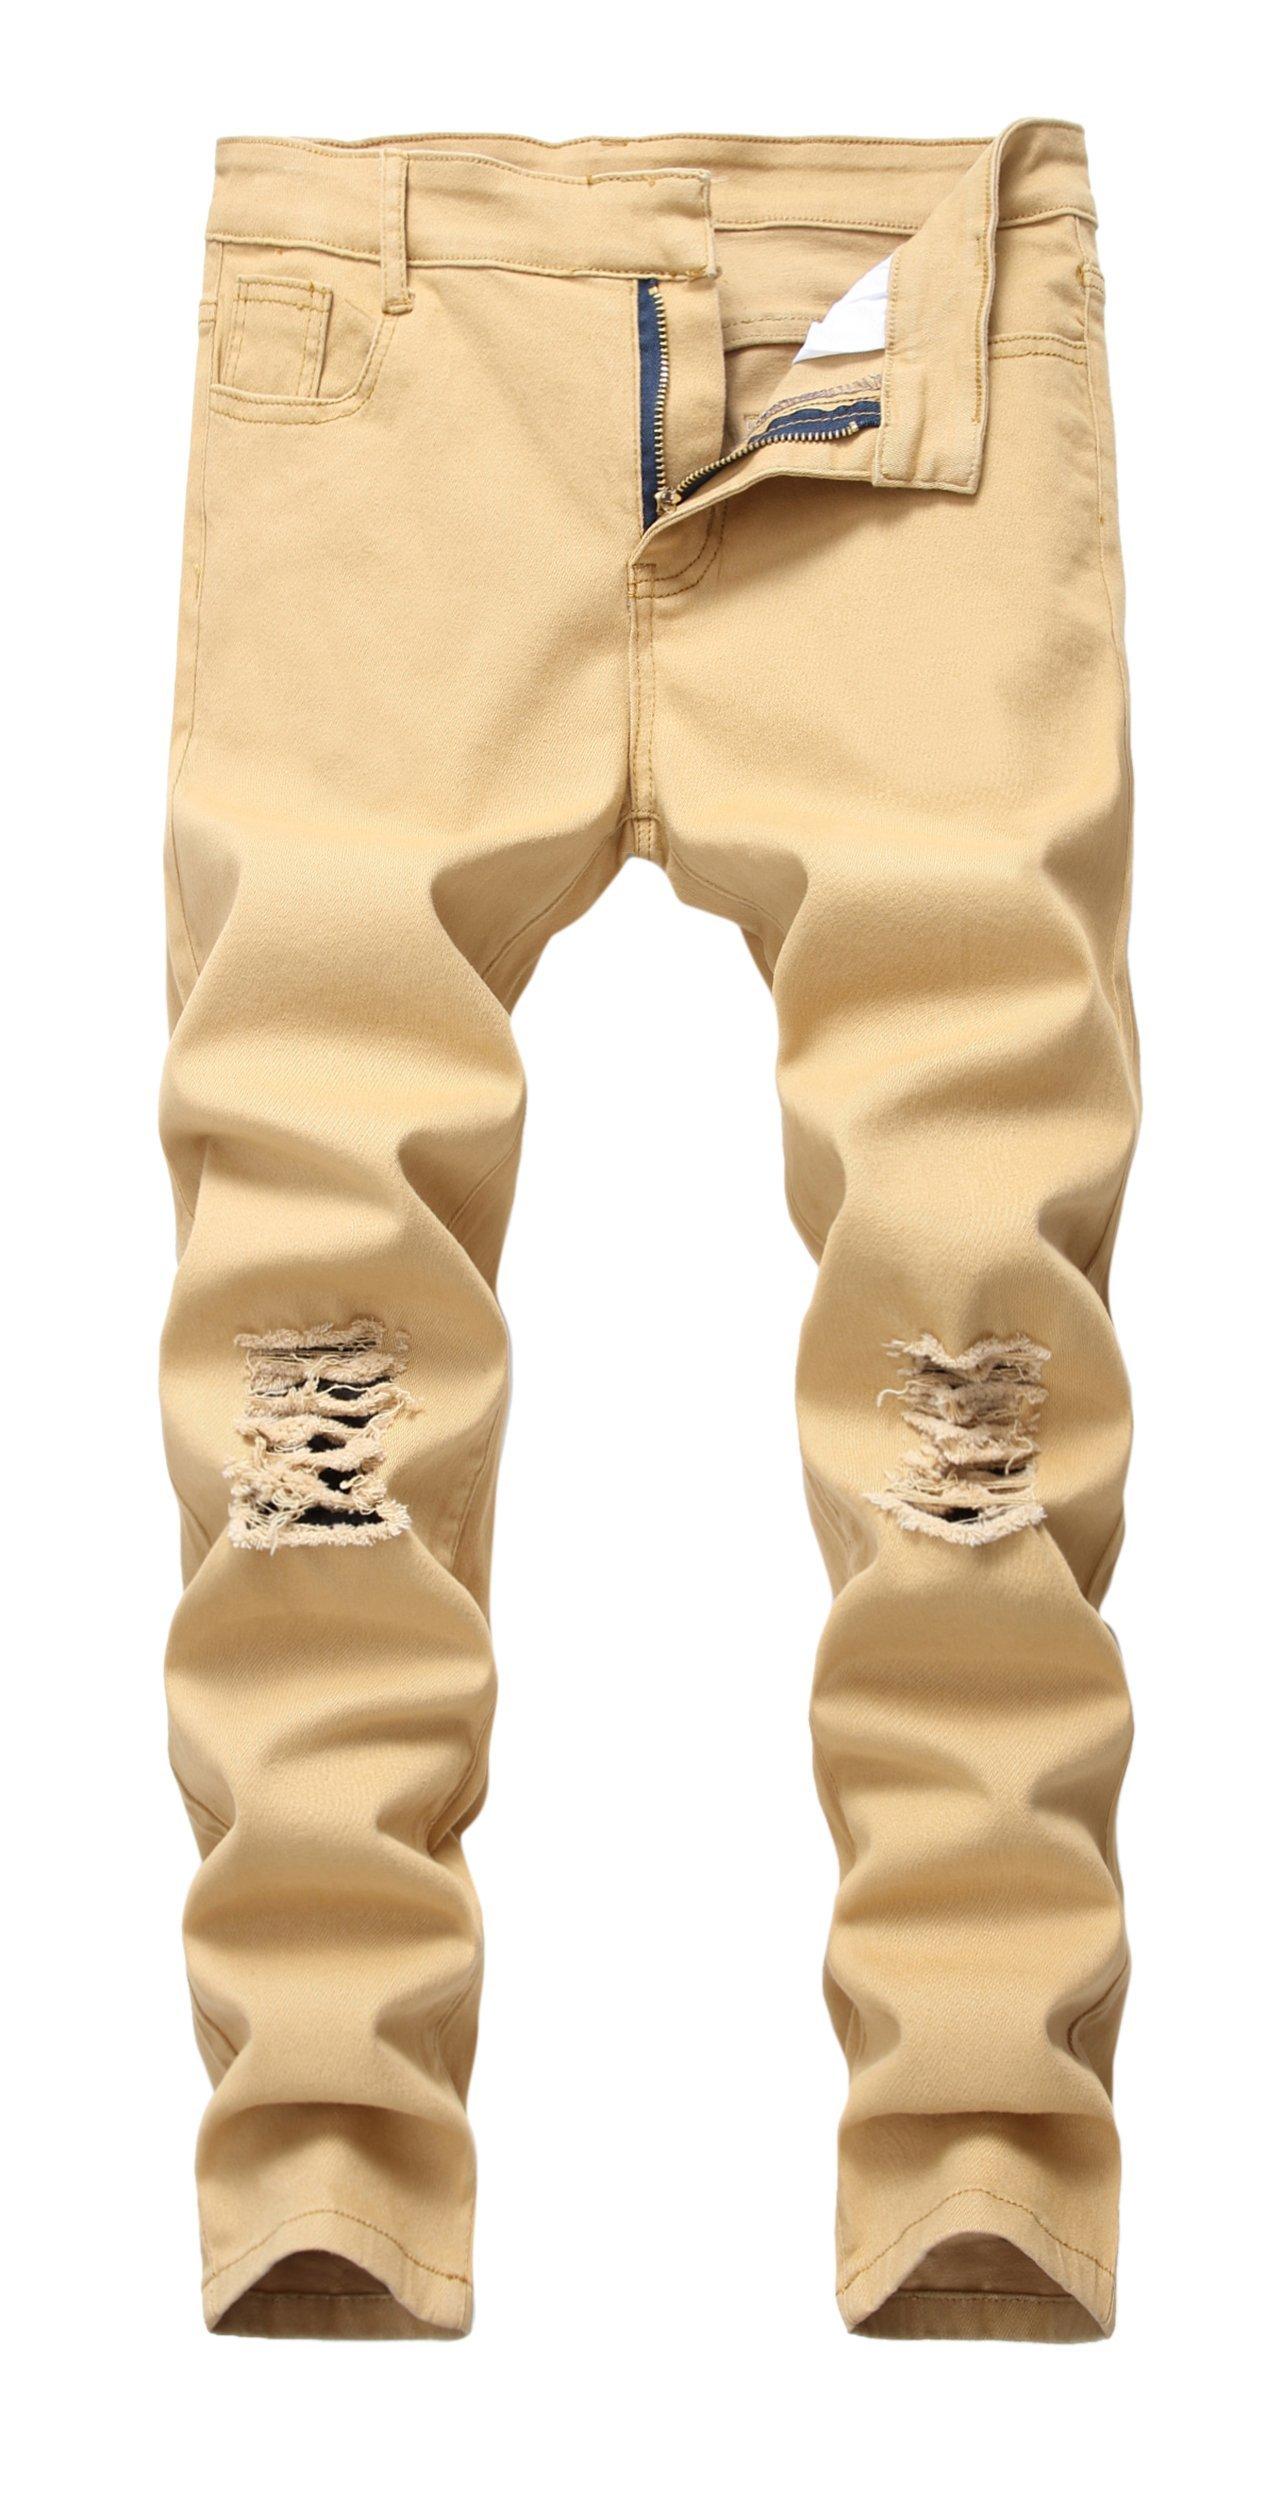 CLOTPUS Boy's Black Skinny Ripped Jeans Slim Fit Distressed Destroyed Stretch Pants Khaki 12